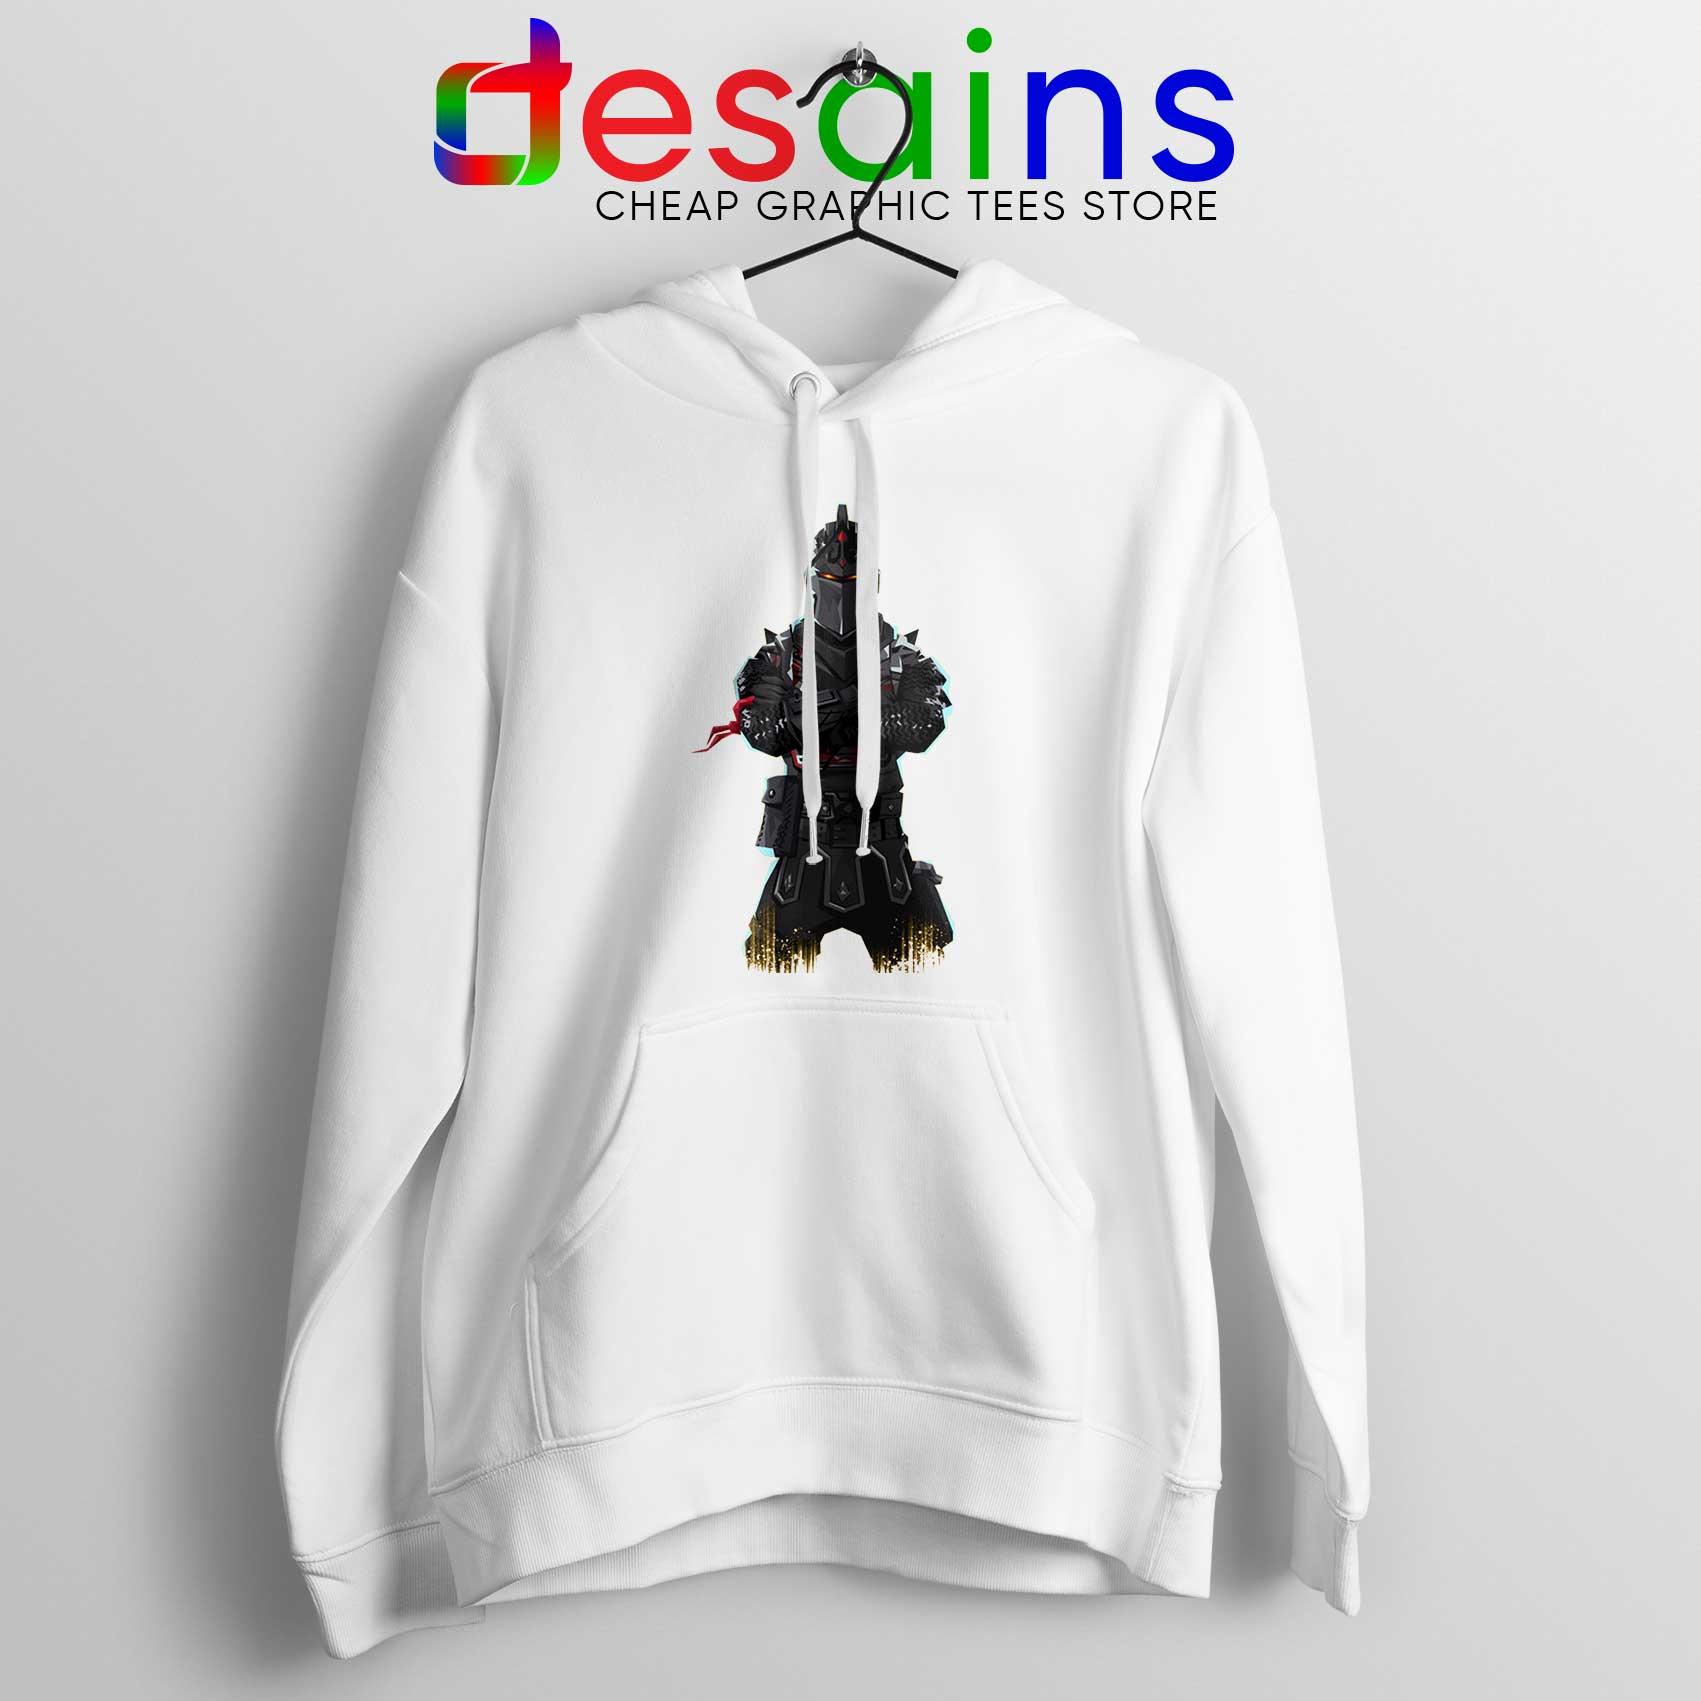 509435d1 Fortnite Legend Video Game Gamer Shirts Teeqq Store - Fortnite Free ...